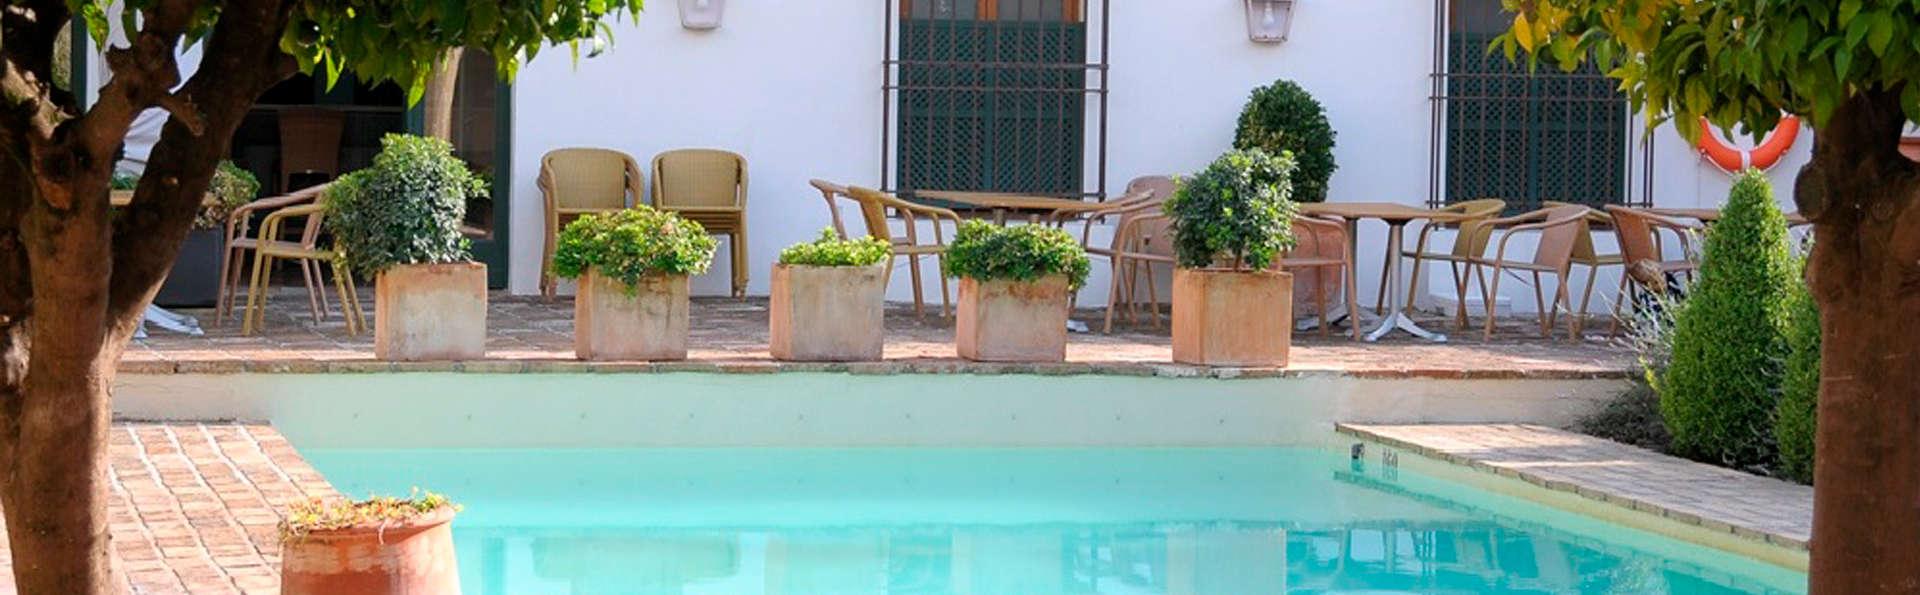 Hotel Puerta de la Luna - edit_pool1.jpg